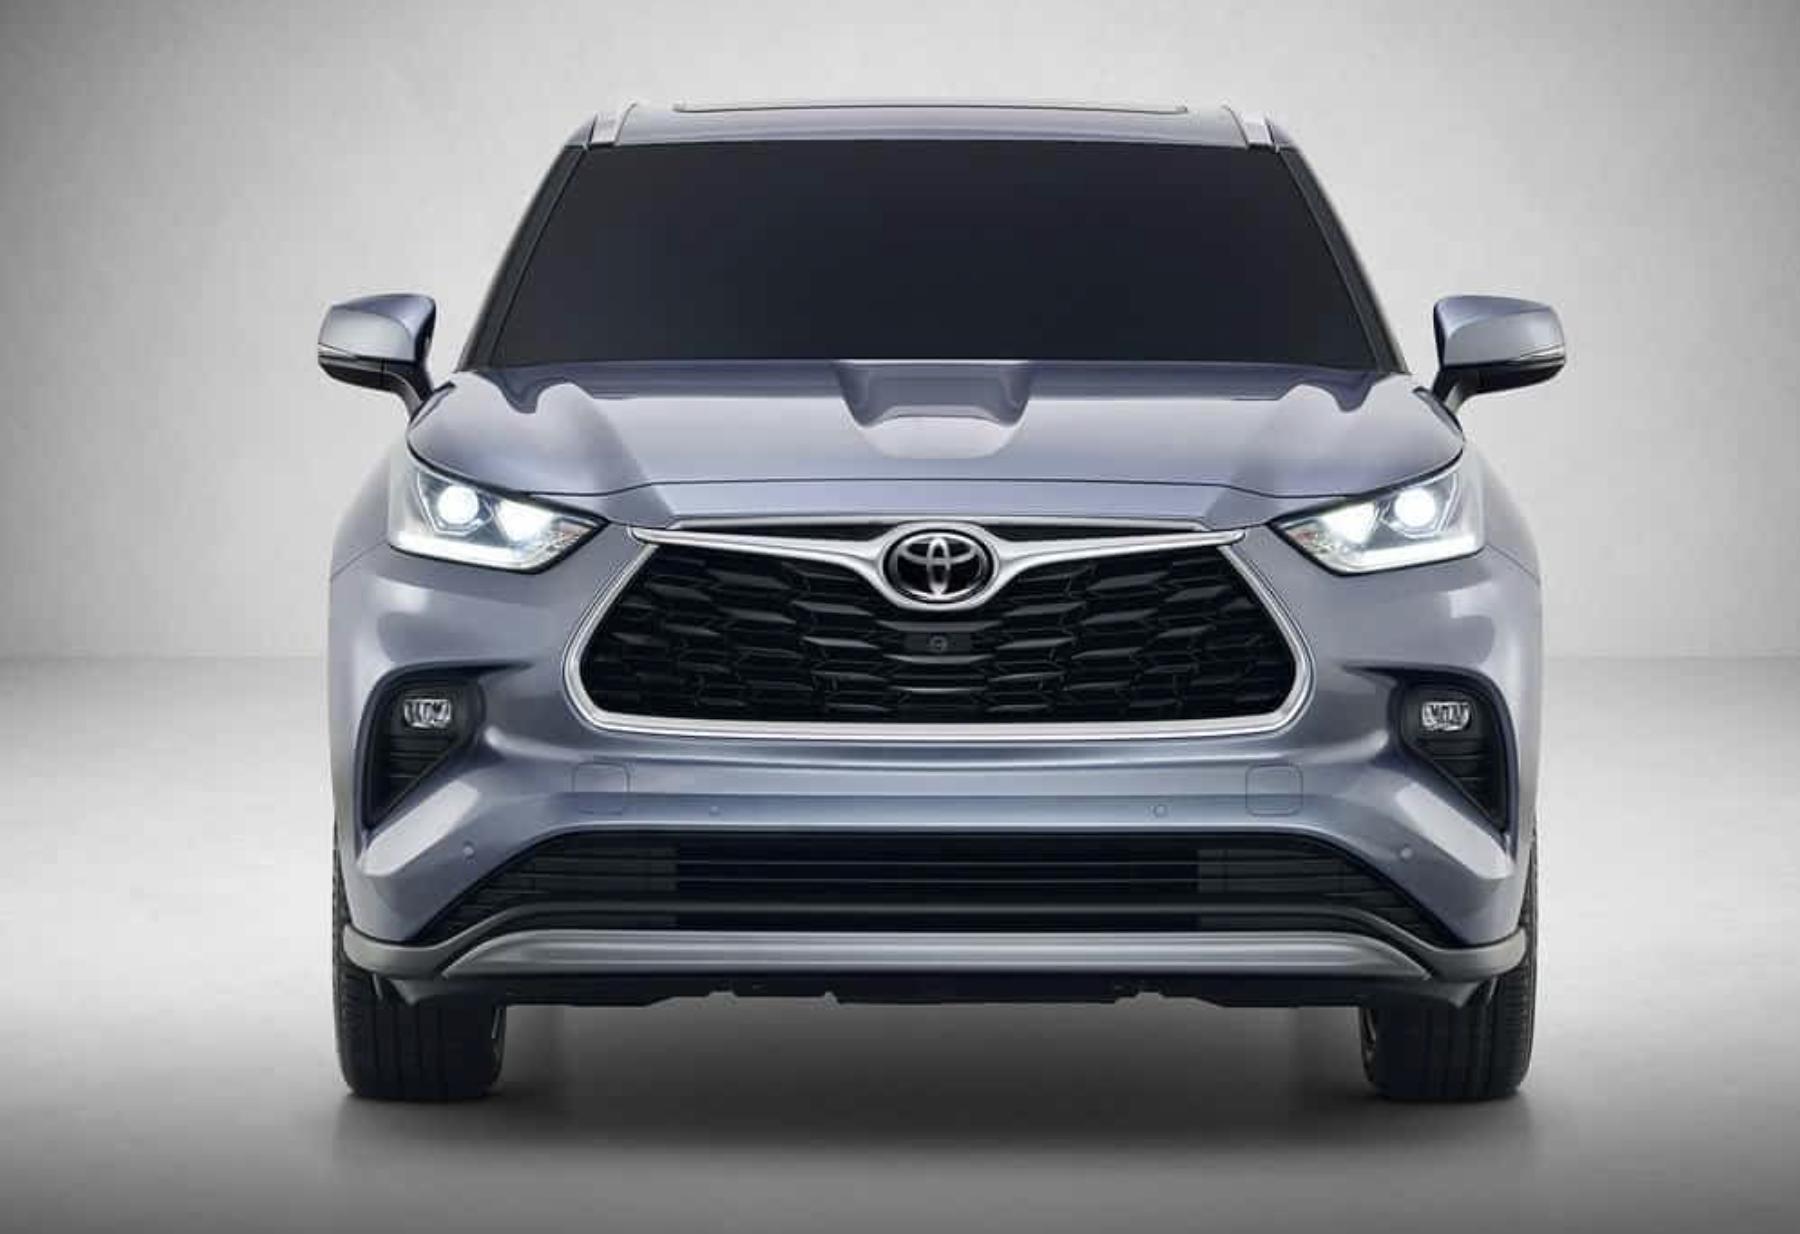 Розгін з місця до 100 км/год за 8,5 с: Toyota Highlander Hybrid представлено офіційно